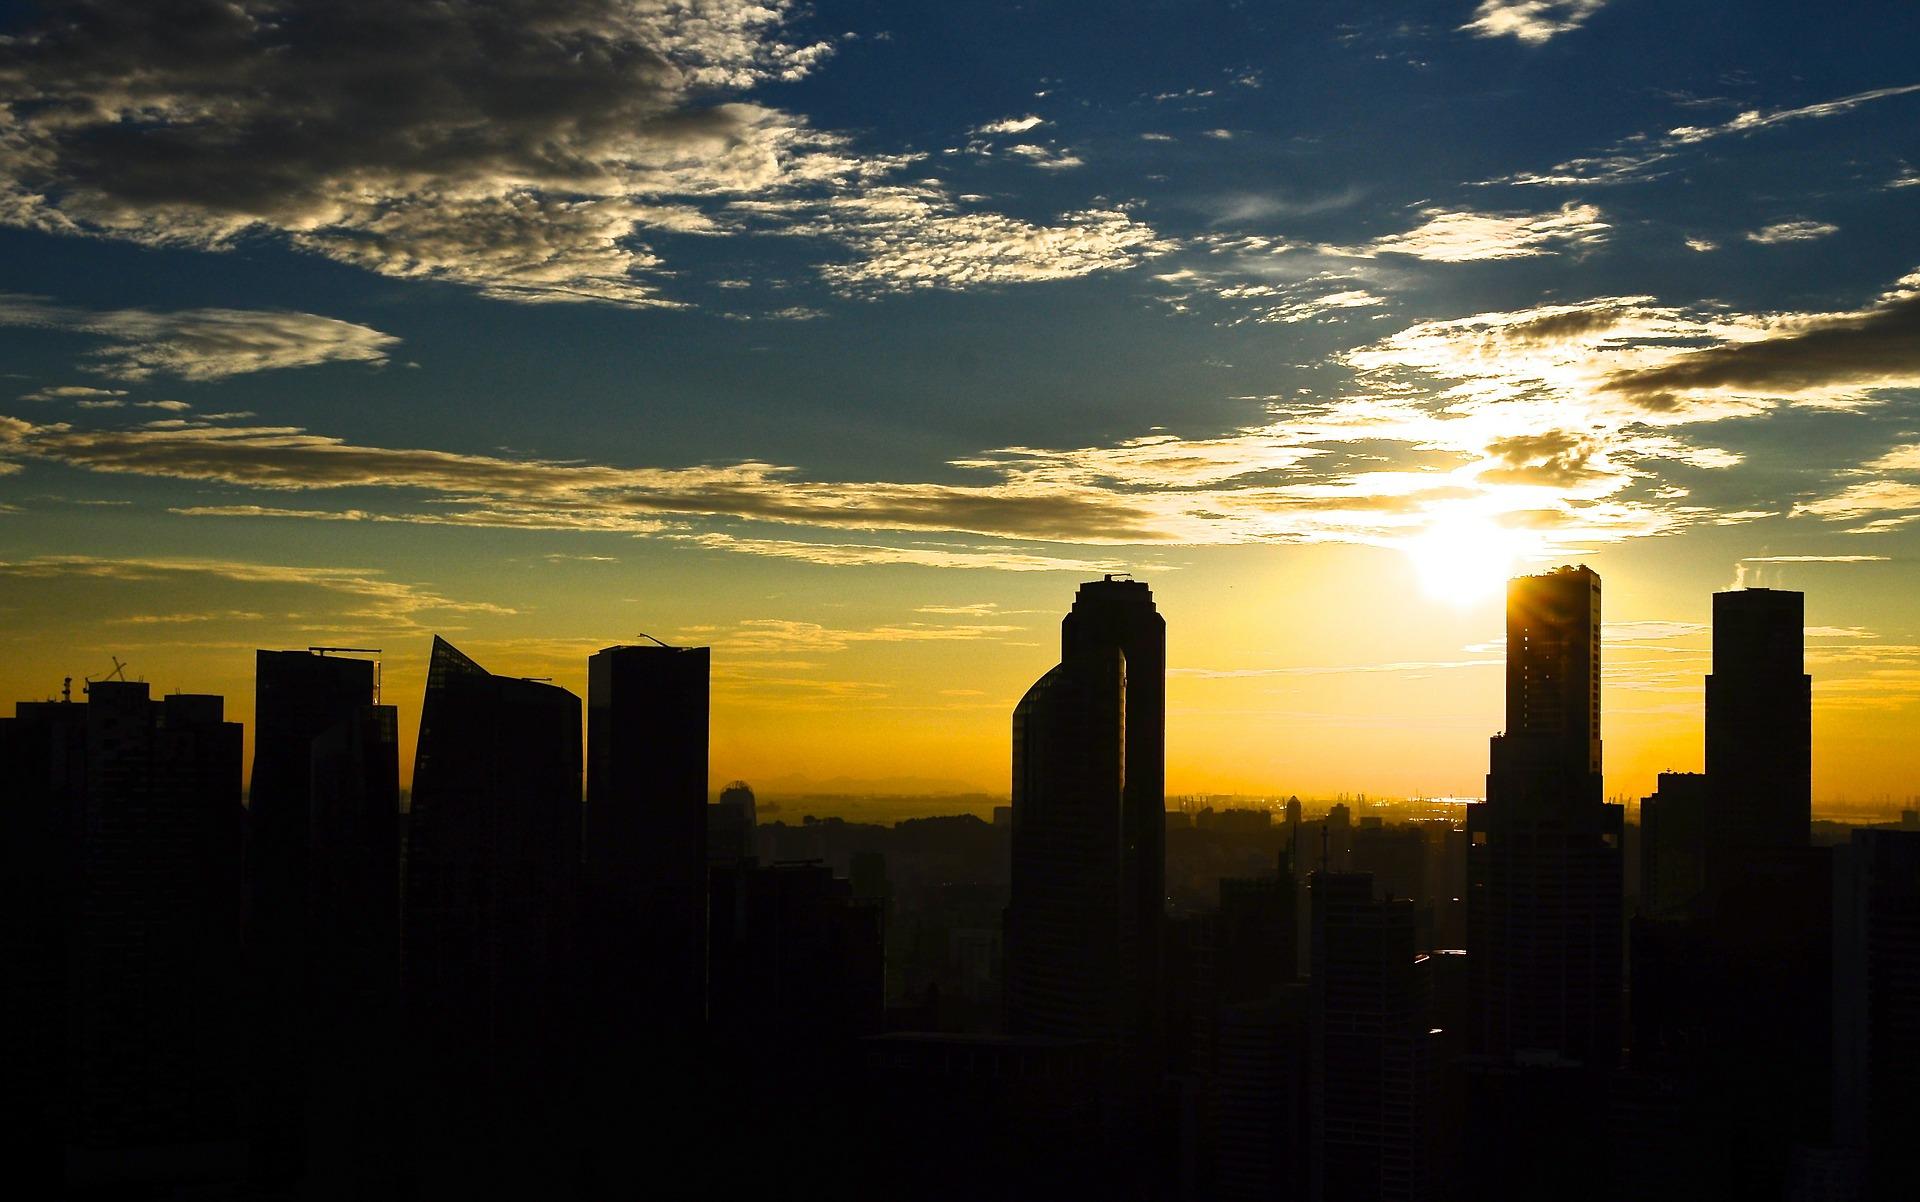 skyline-200679_1920.jpg